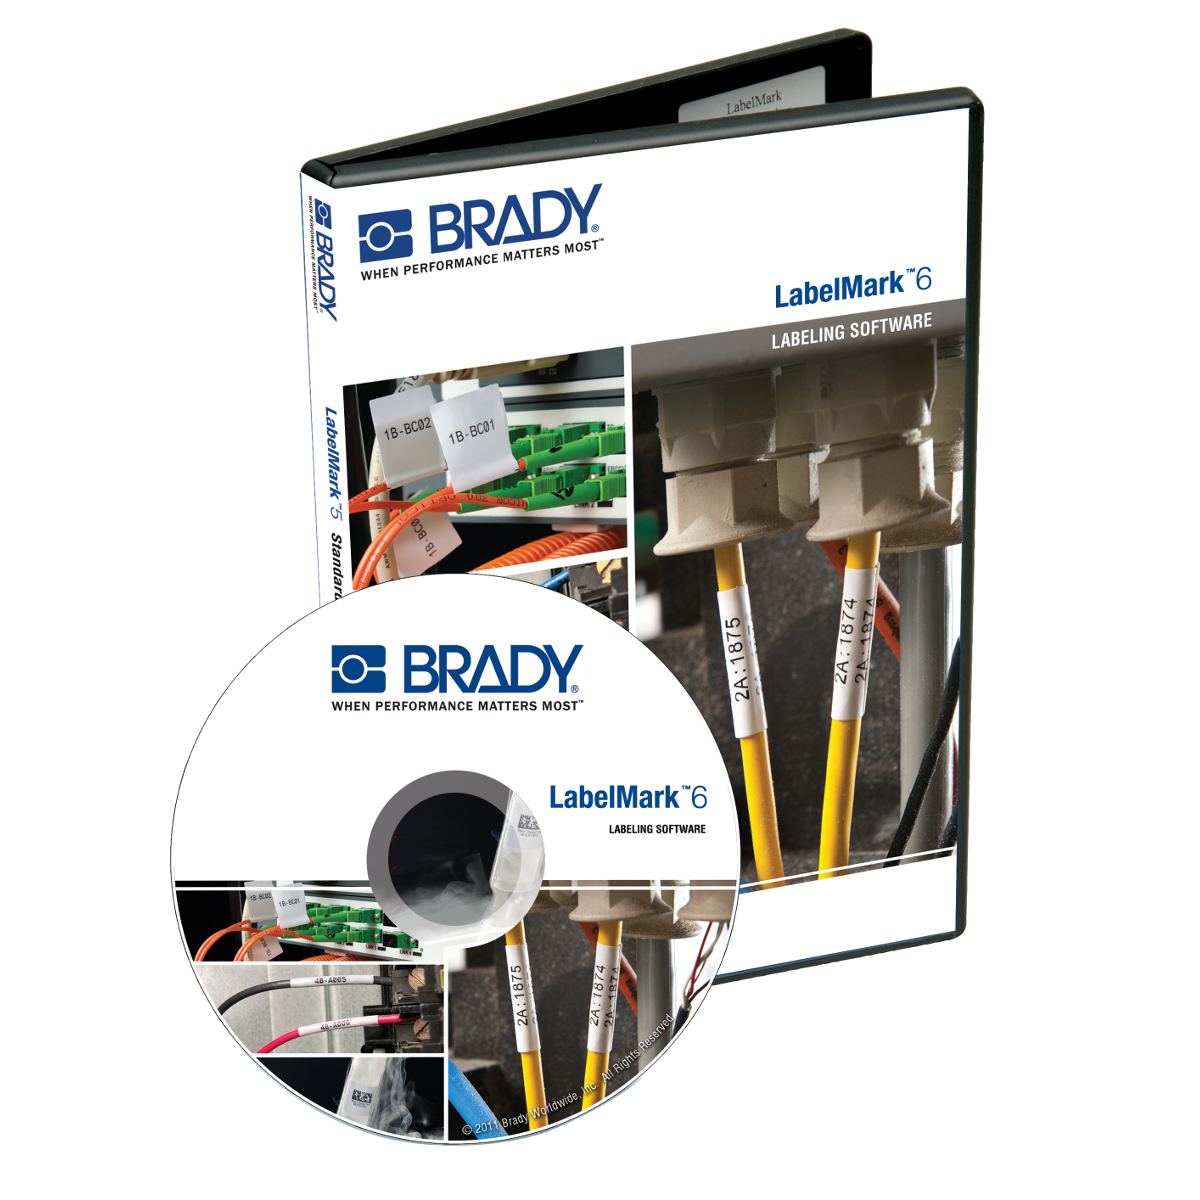 LMO6UPGRCD BRADY LABELMARK CD UPG PRO V3/4/5-V6.2 75447394924